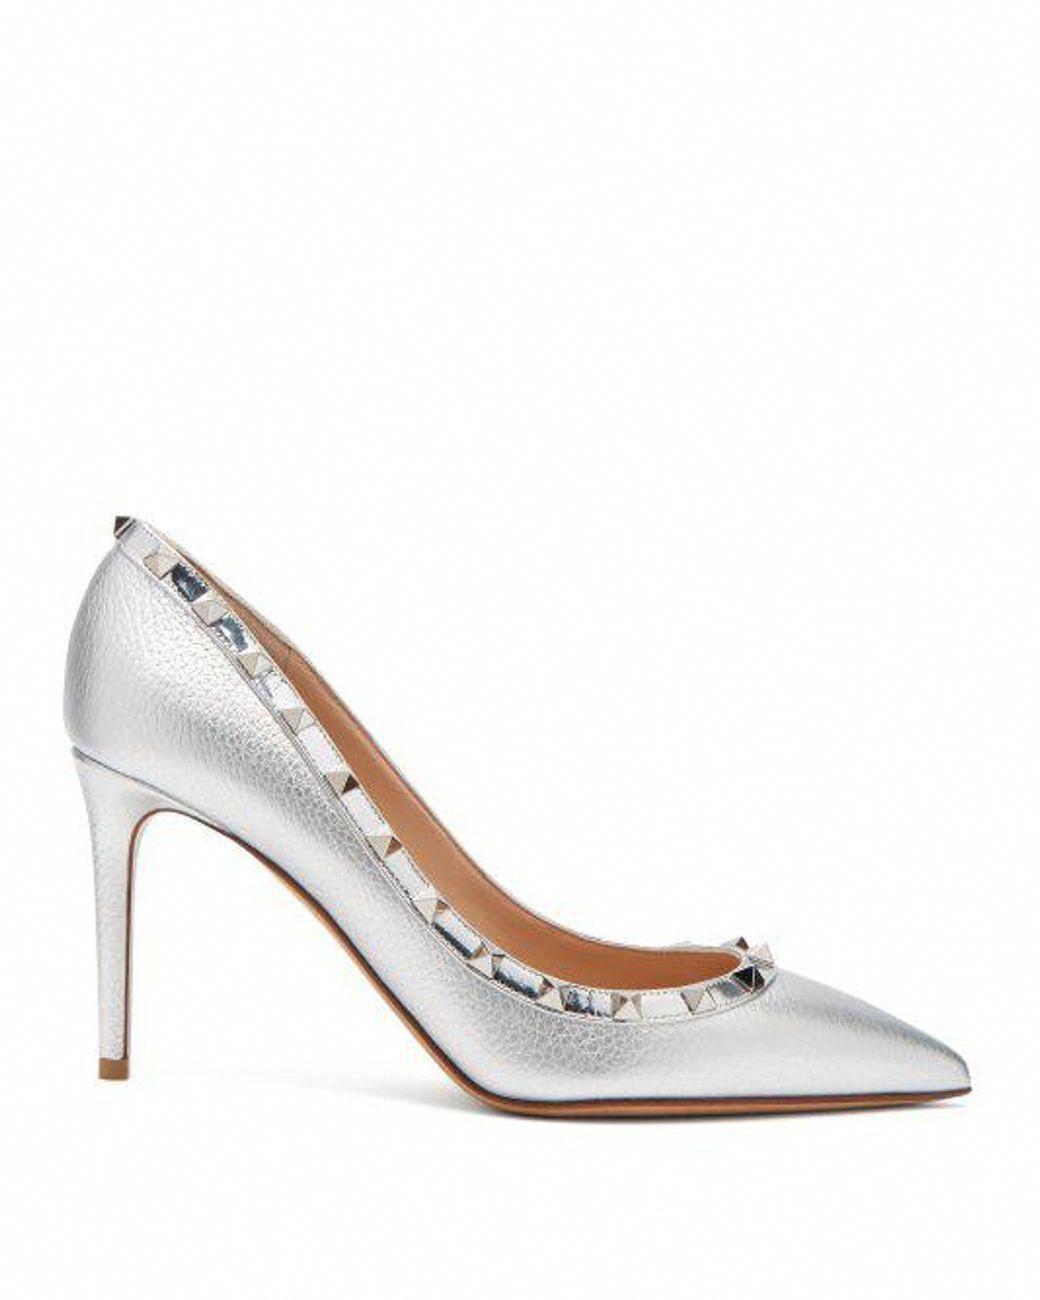 416413aa17c Valentino - Rockstud Metallic Point Toe Leather Pumps - Lyst  Valentino